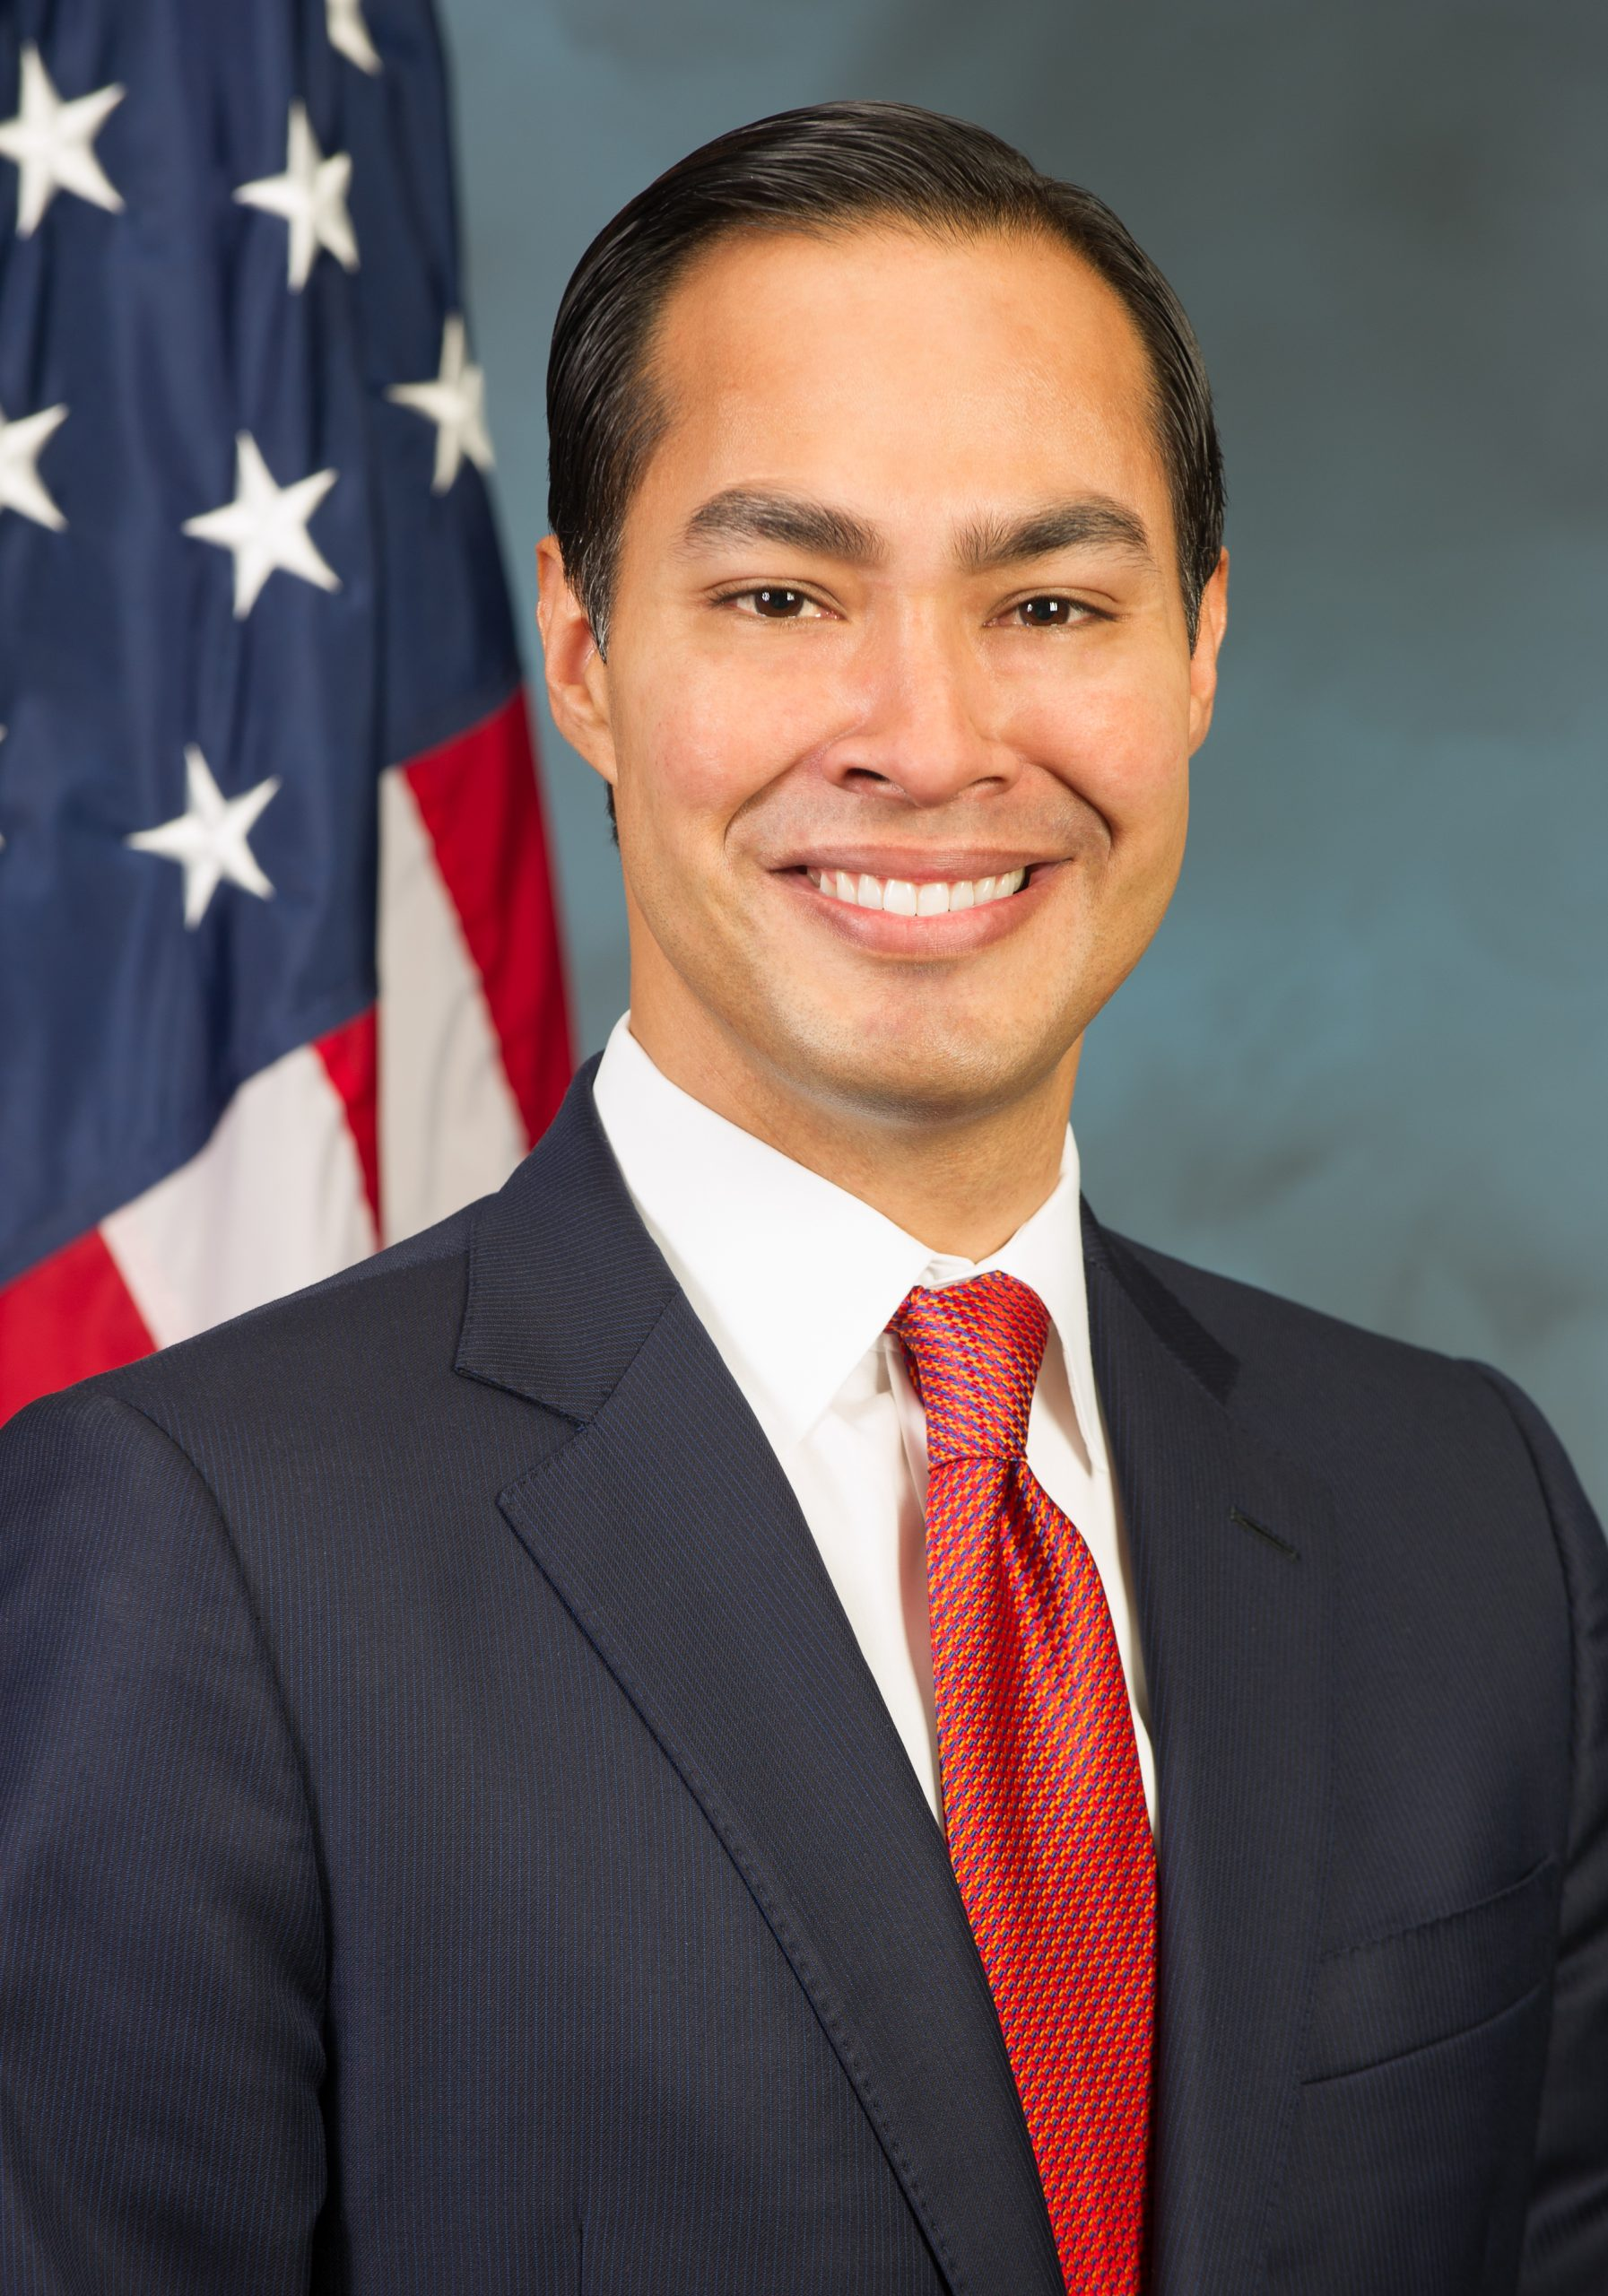 Julian Castro headshot